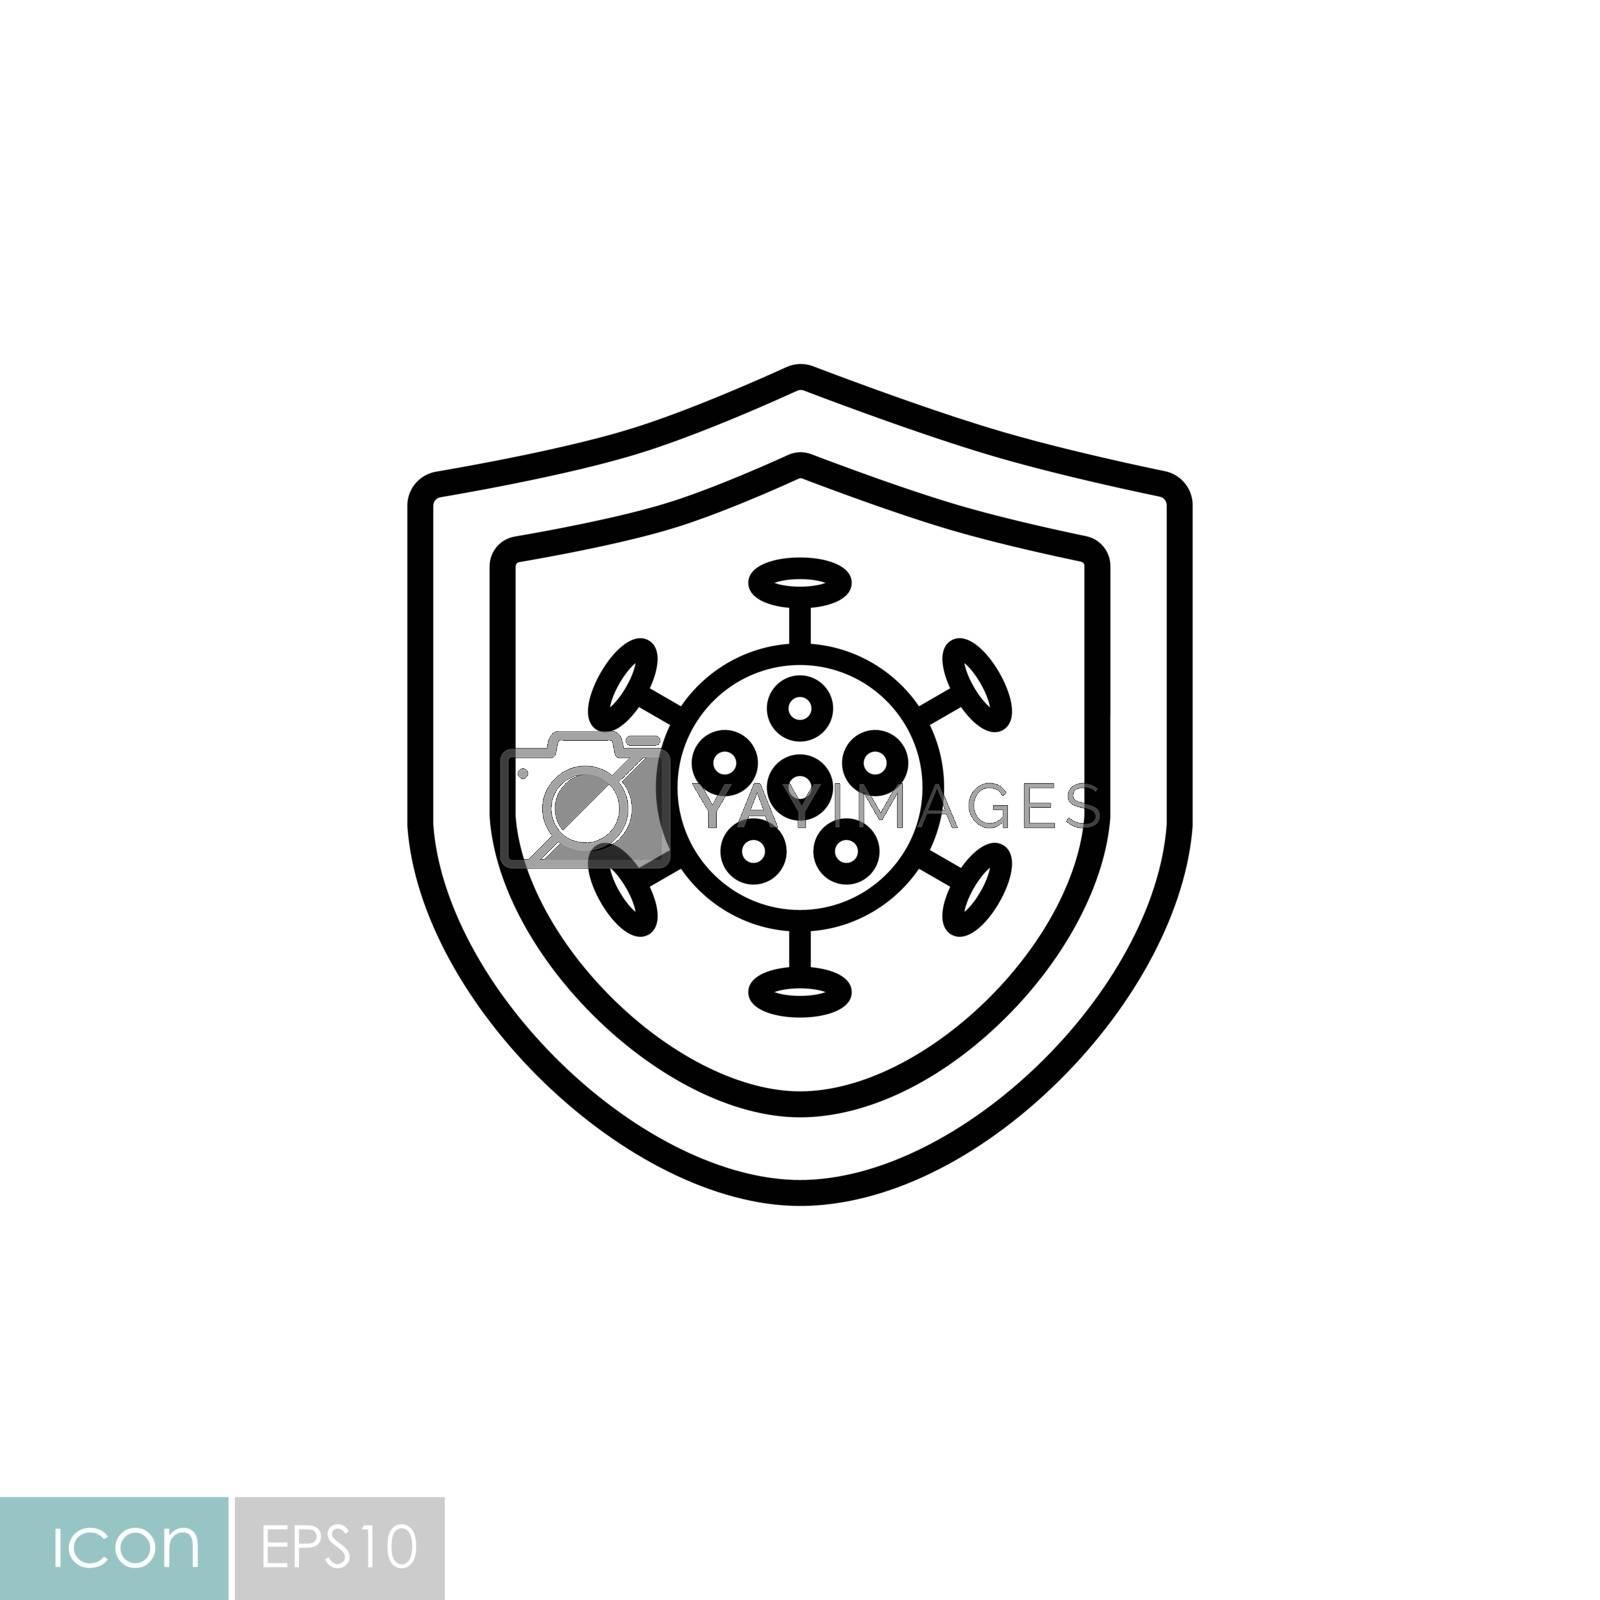 Corona virus protection vector icon. Medical sign. Coronavirus. Graph symbol for medical web site and apps design, logo, app, UI